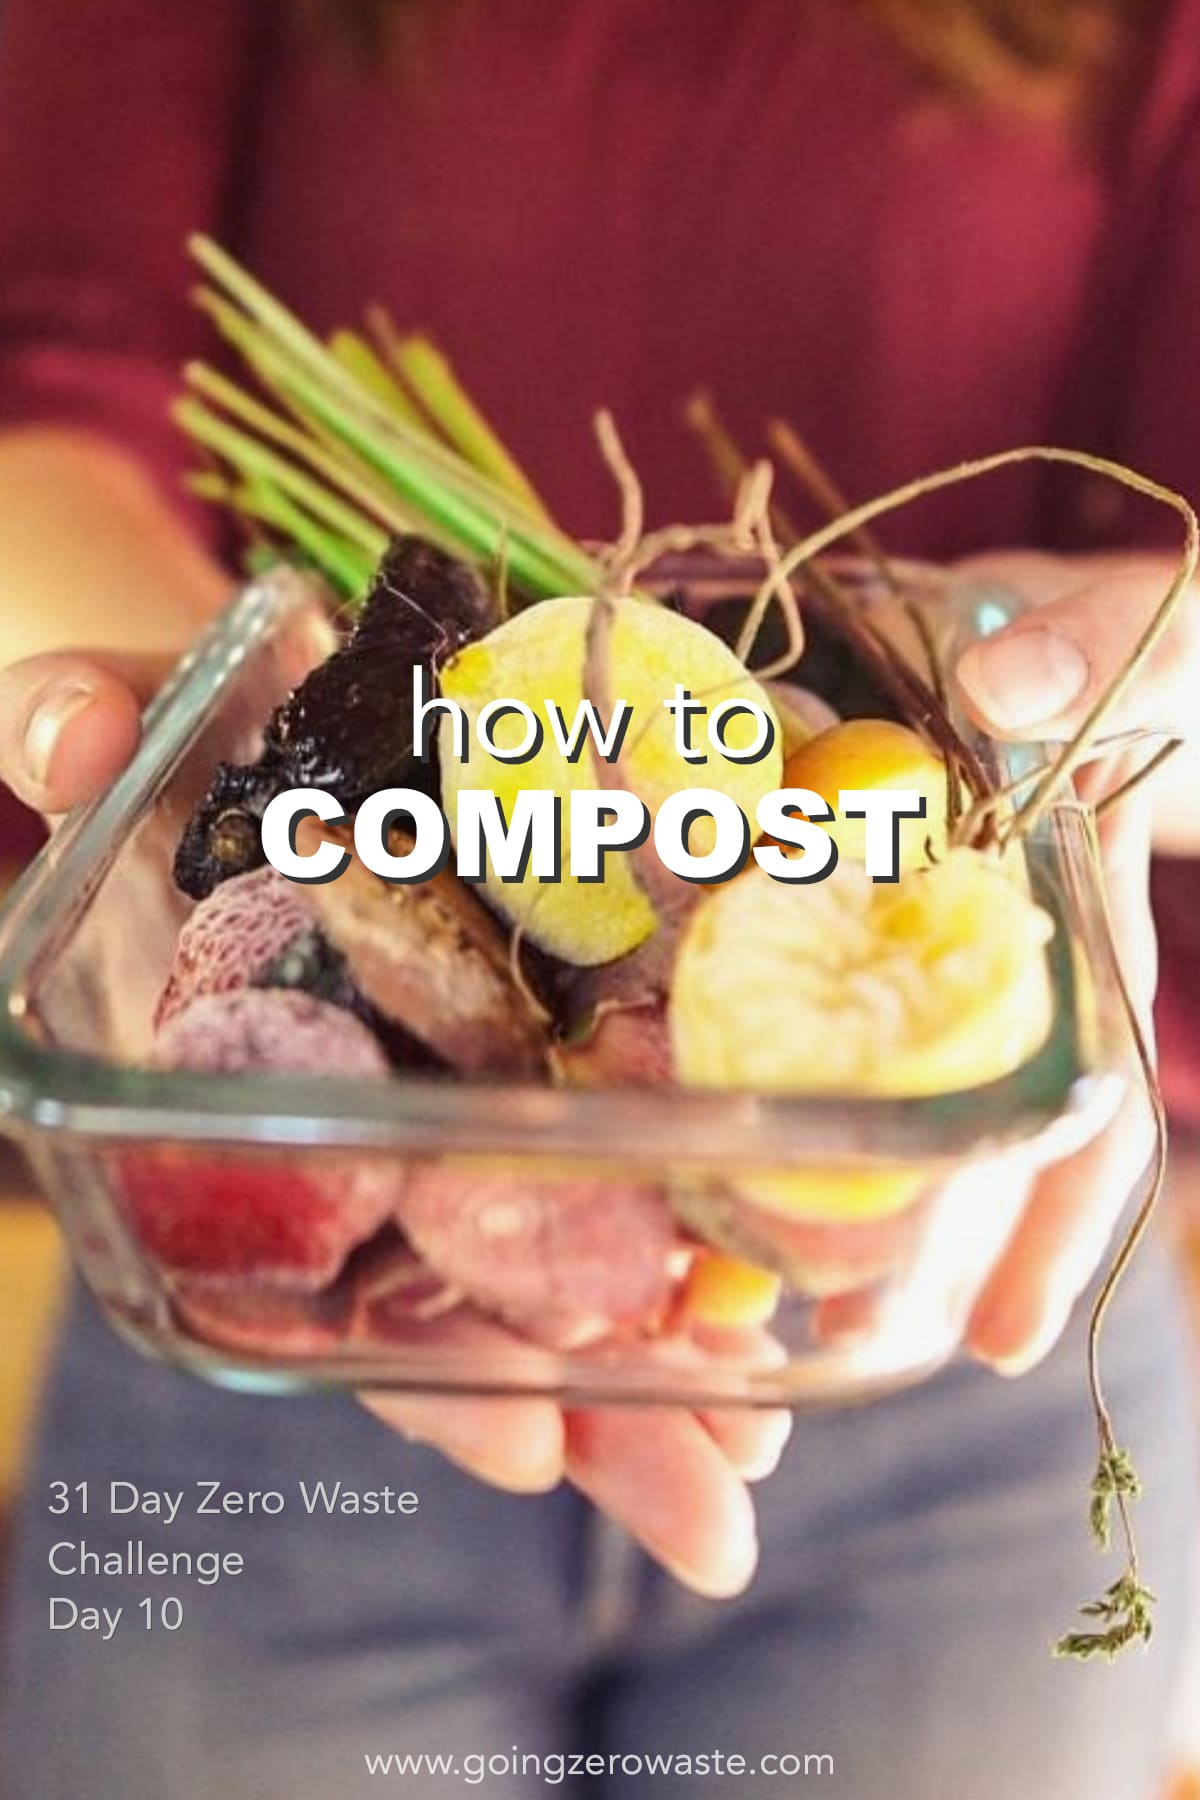 How to Compost - Day 10 of the Zero Waste Challenge from www.goingzerowaste.com #zerowaste #ecofriendly #gogreen #sustainable #zerowastechallenge #challenge #sustainablelivingchallenge #compost #composting